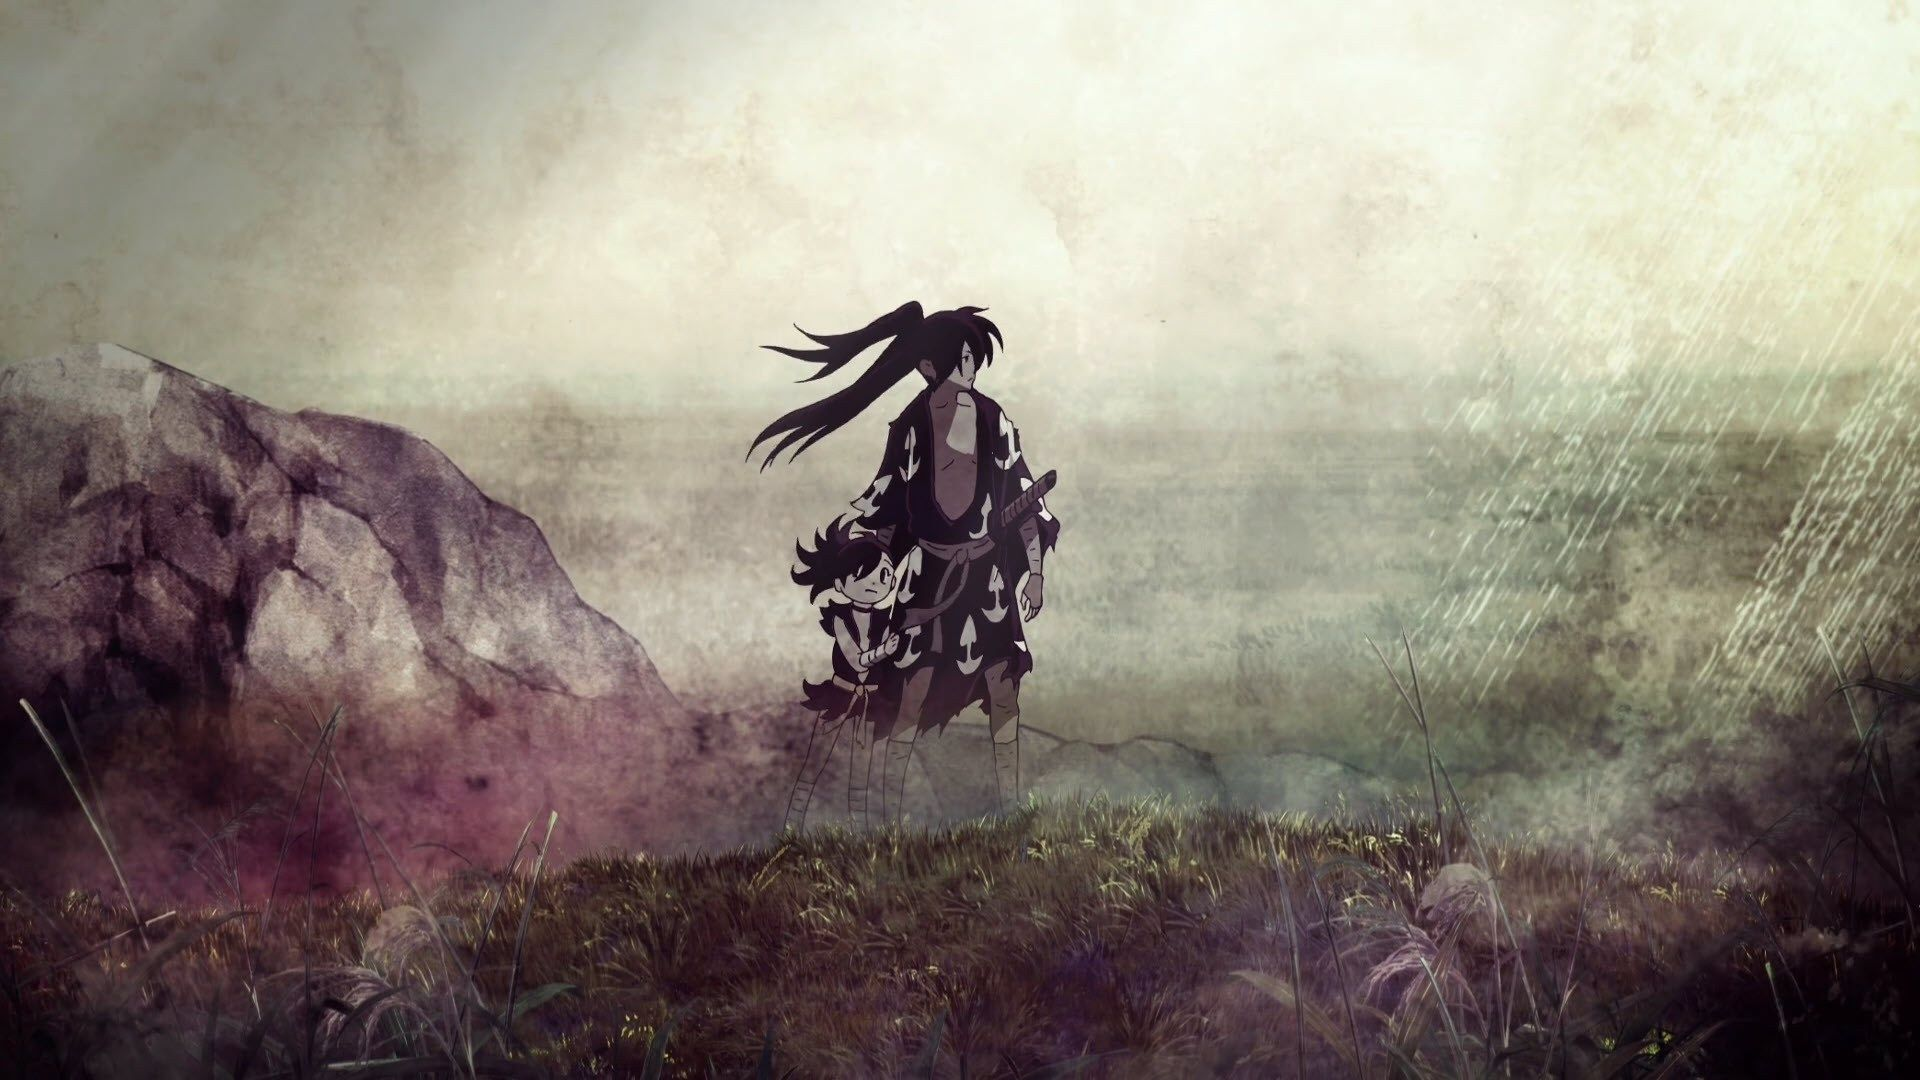 Dororo Wallpapers Hd In 2020 Anime Wallpaper Anime Samurai Anime